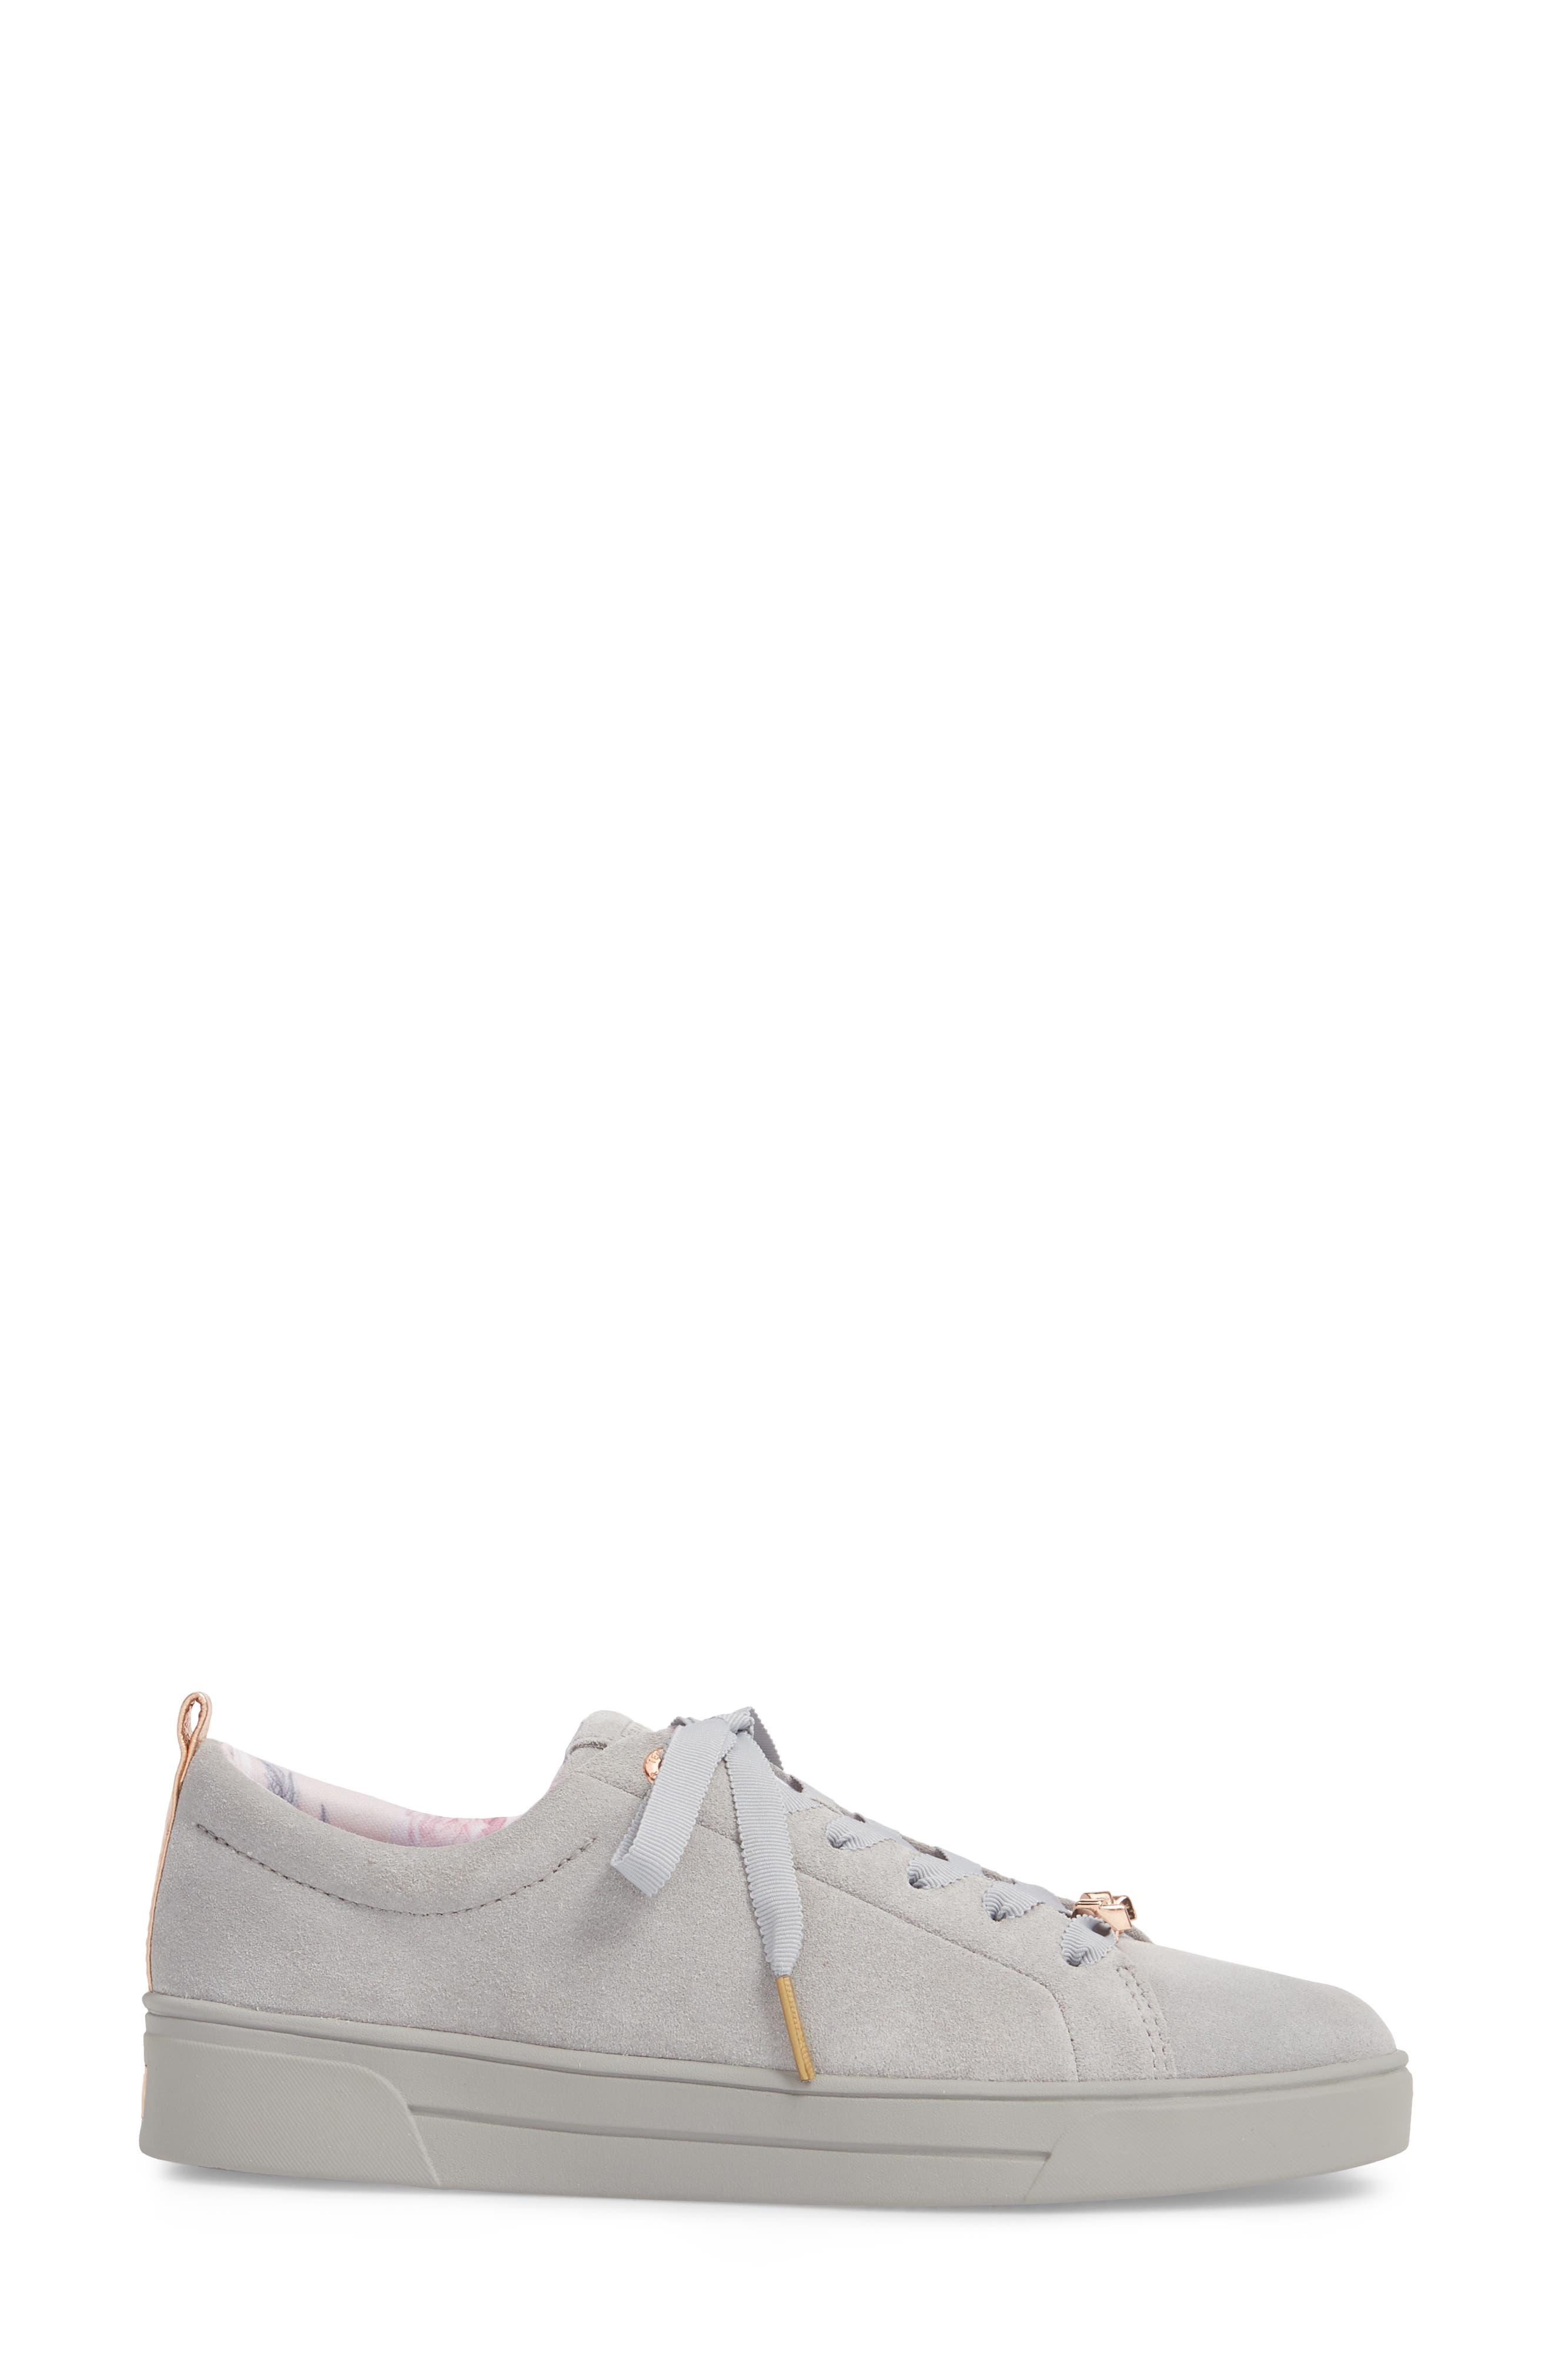 Kelleis Sneaker,                             Alternate thumbnail 3, color,                             LIGHT GREY SUEDE